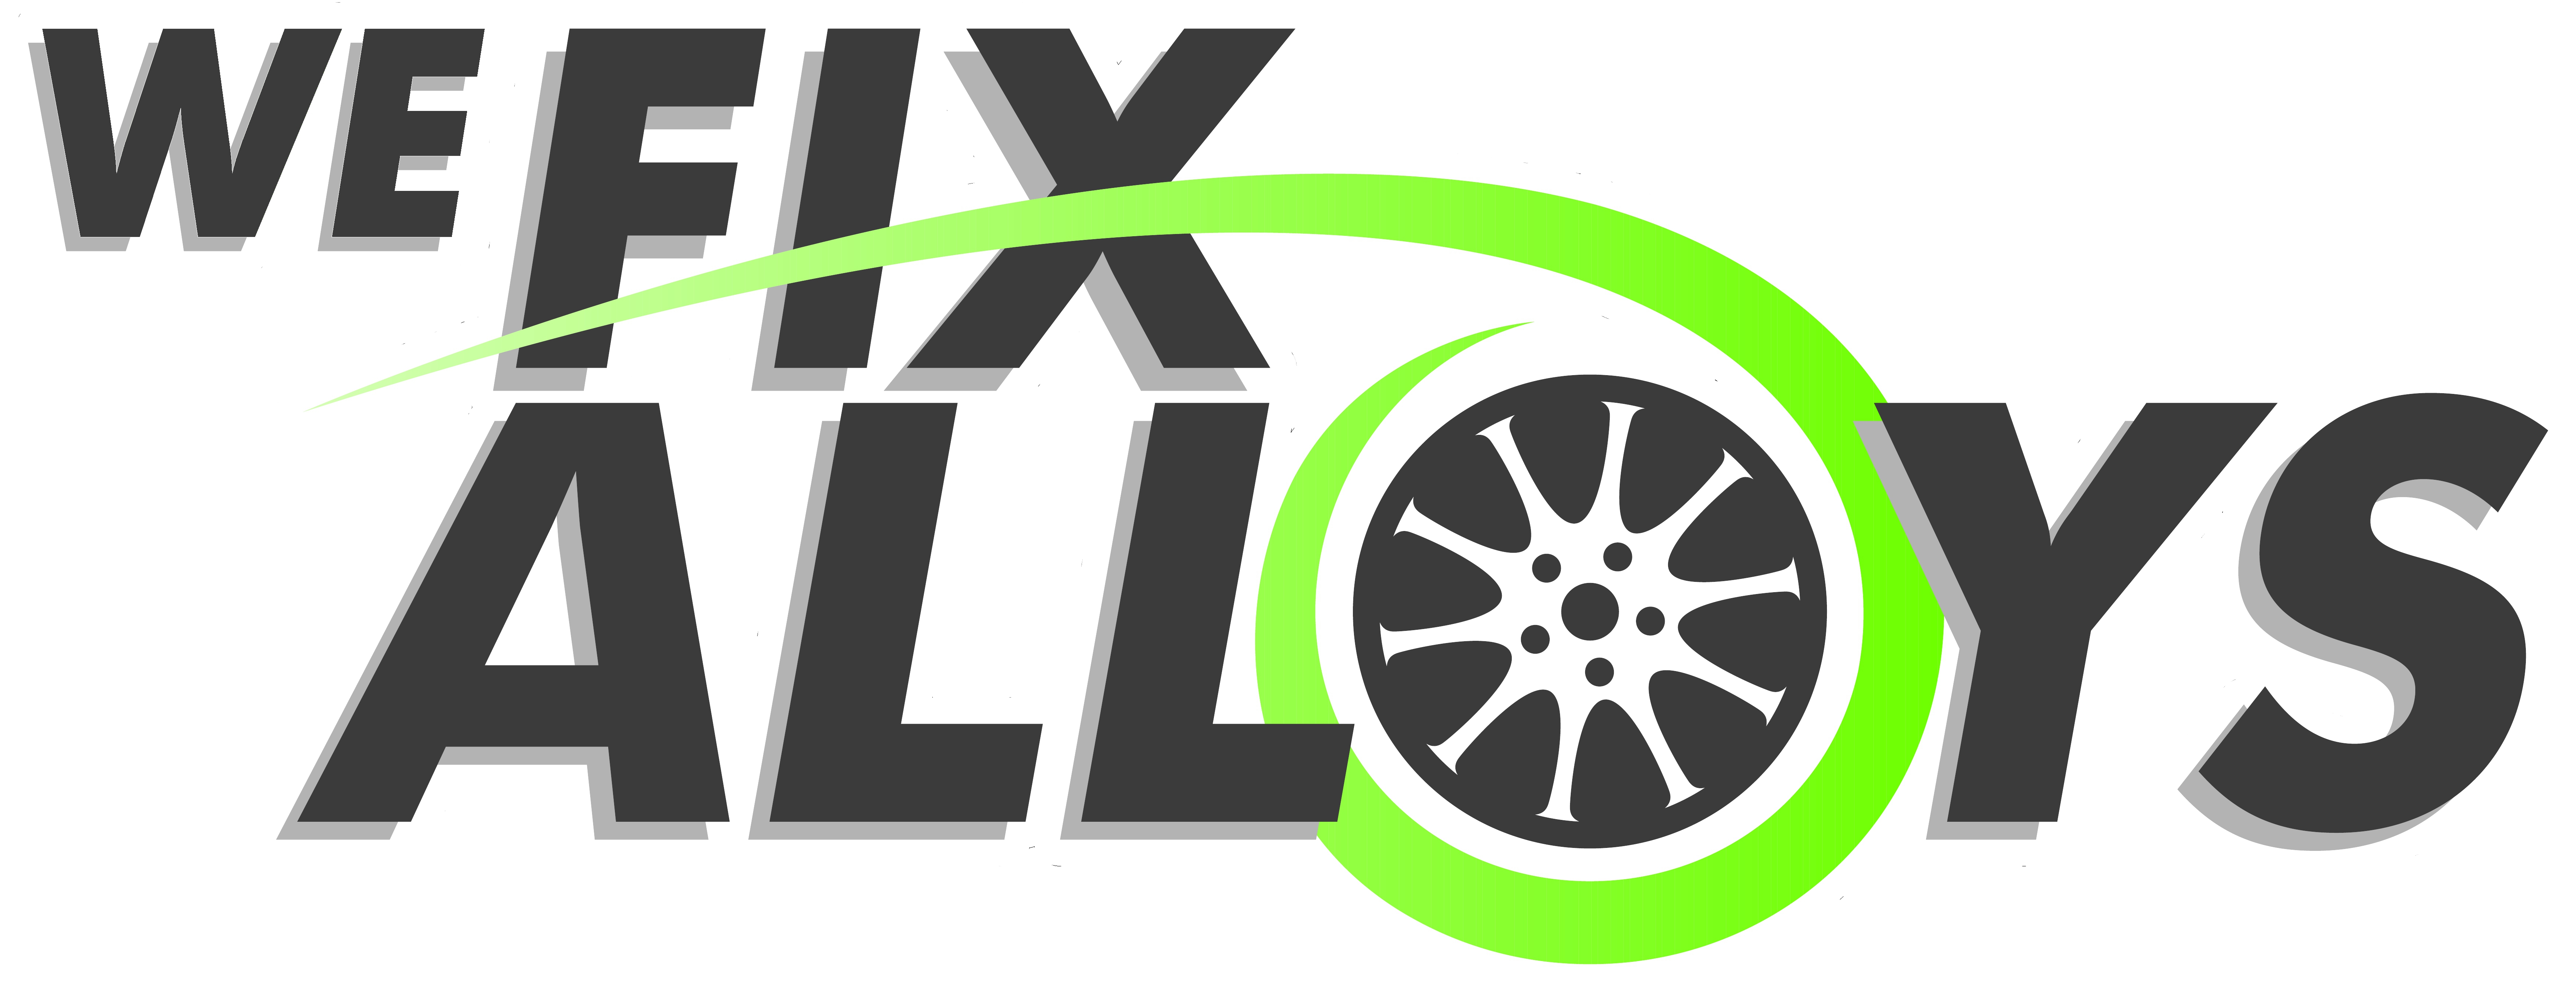 alloy wheel repair Newcastle